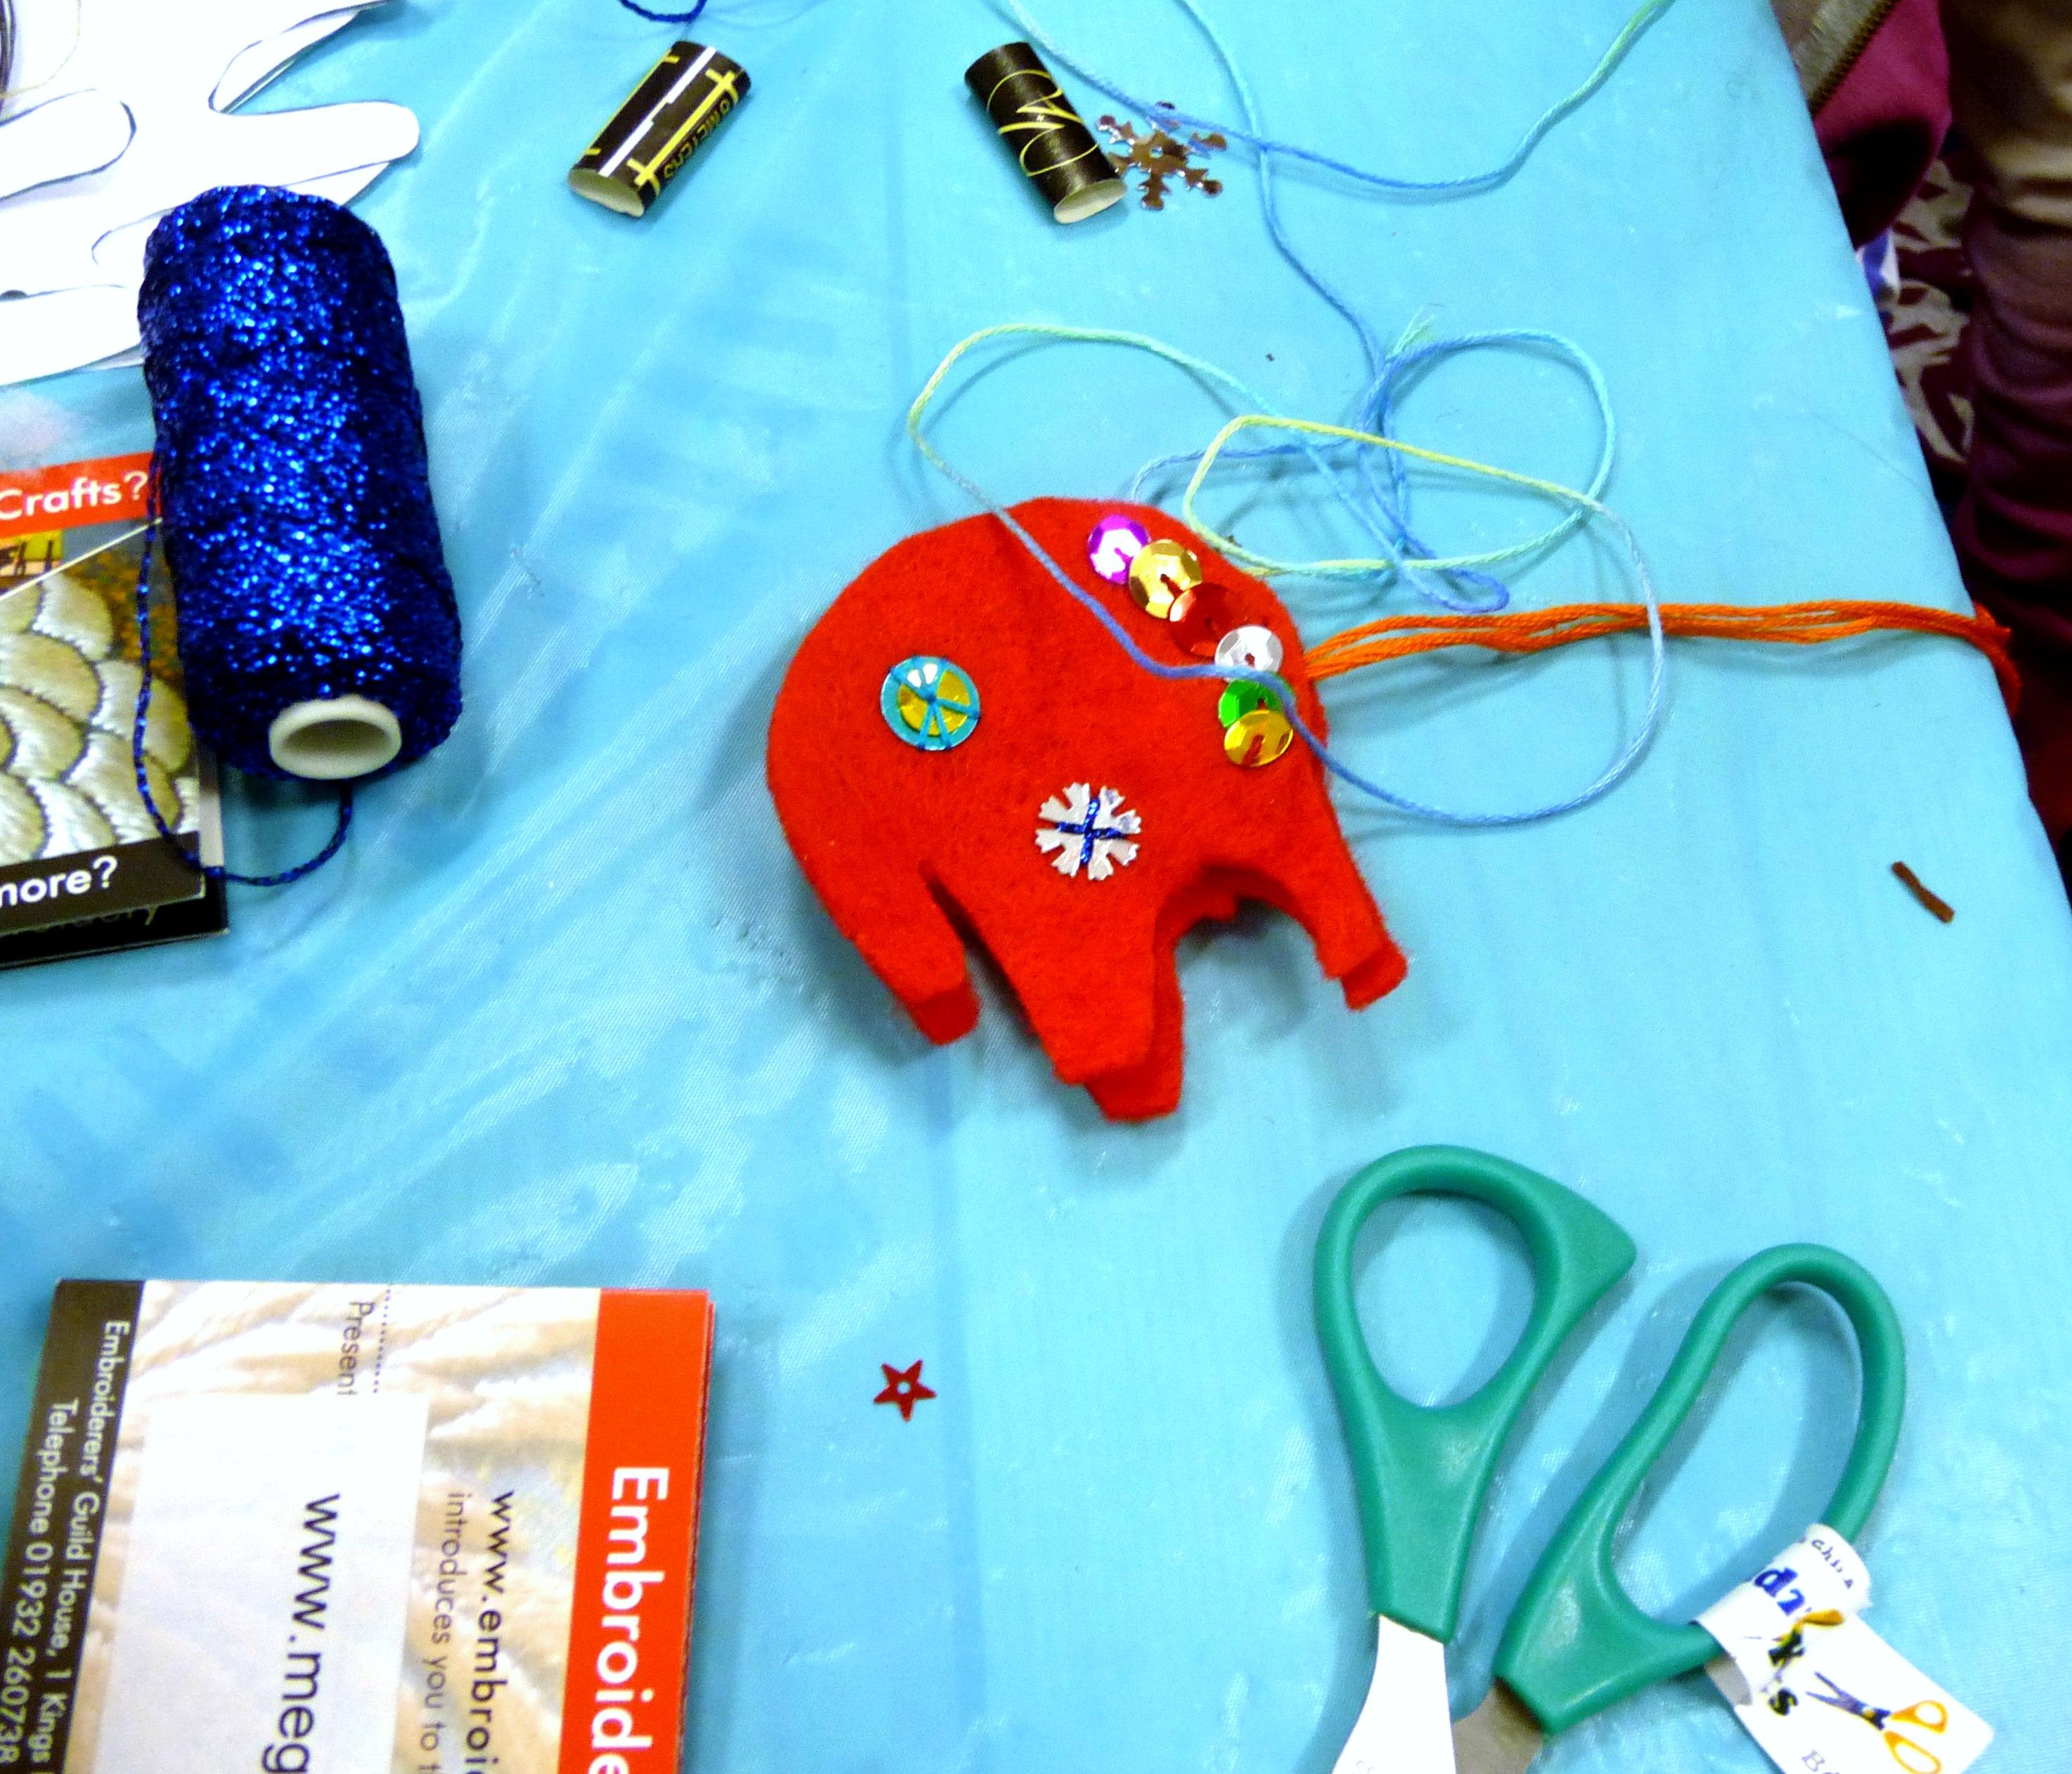 MEG ran a workshop making embroidered elephants at MAKEFEST in Liverpool Central Library, June 2015